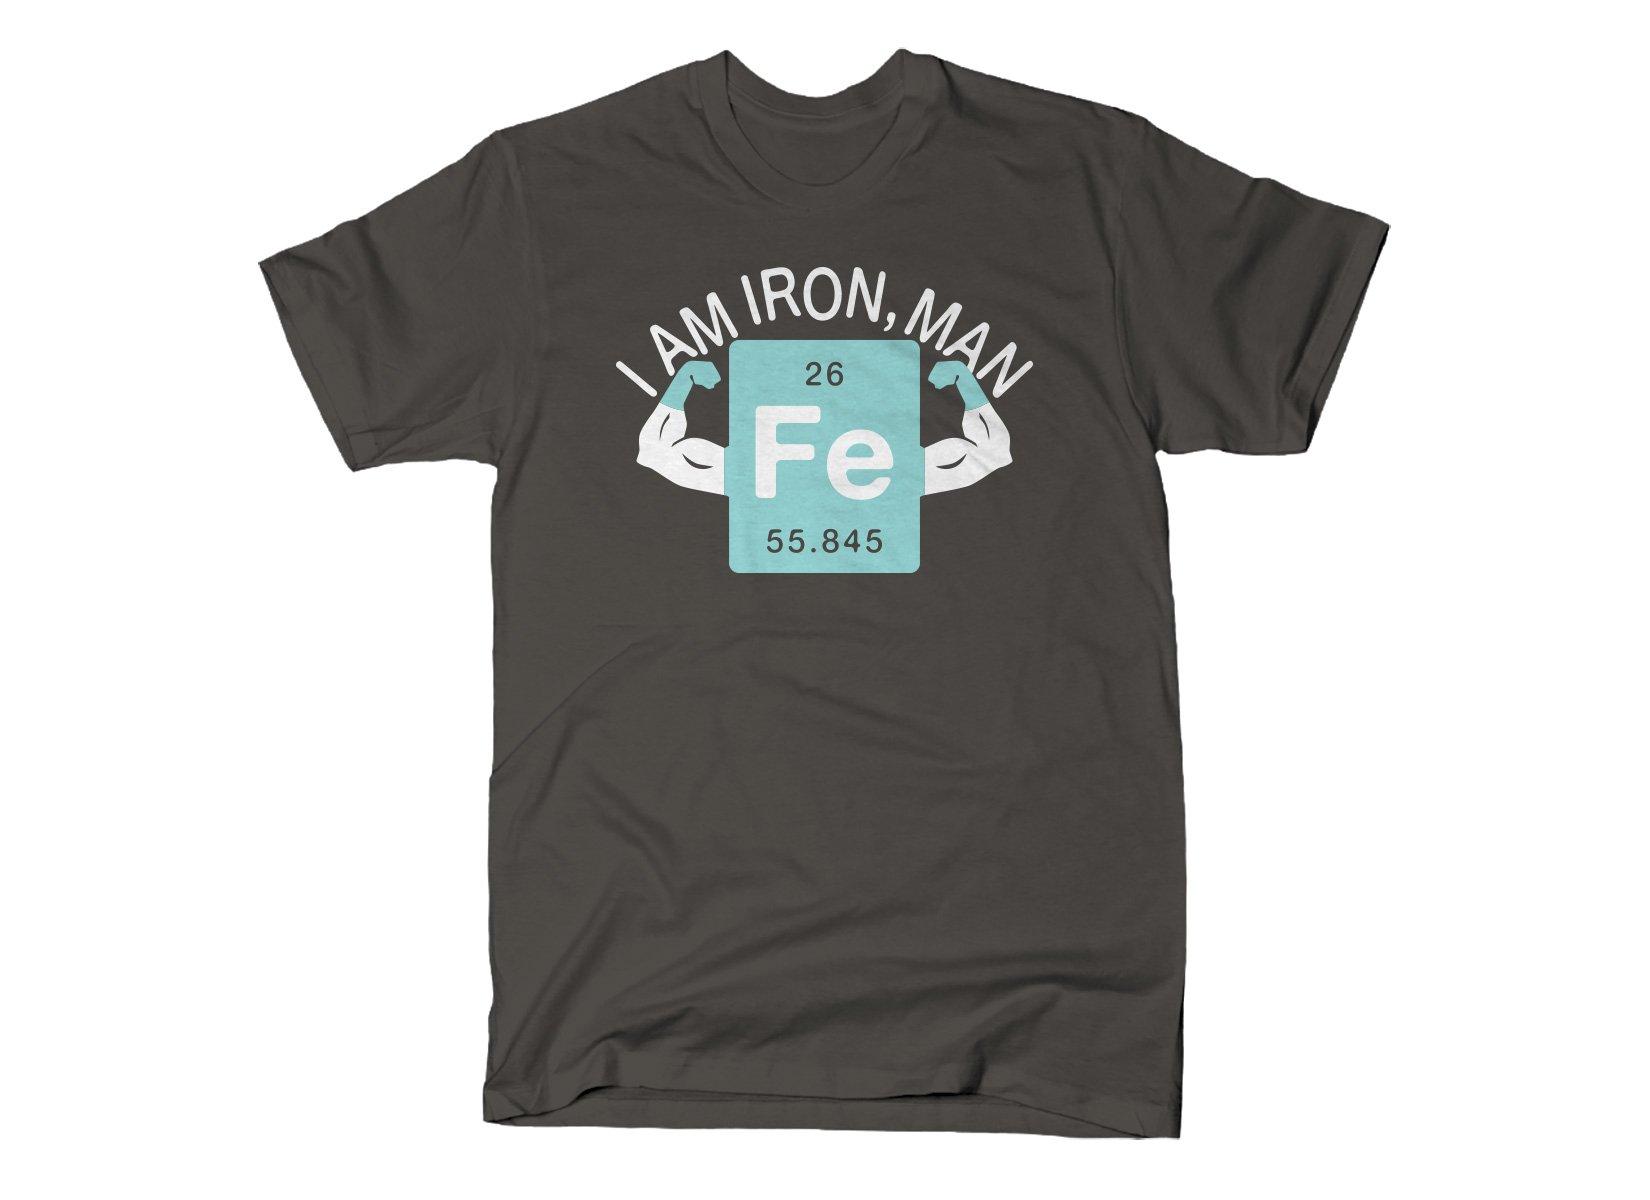 I Am Iron, Man on Mens T-Shirt